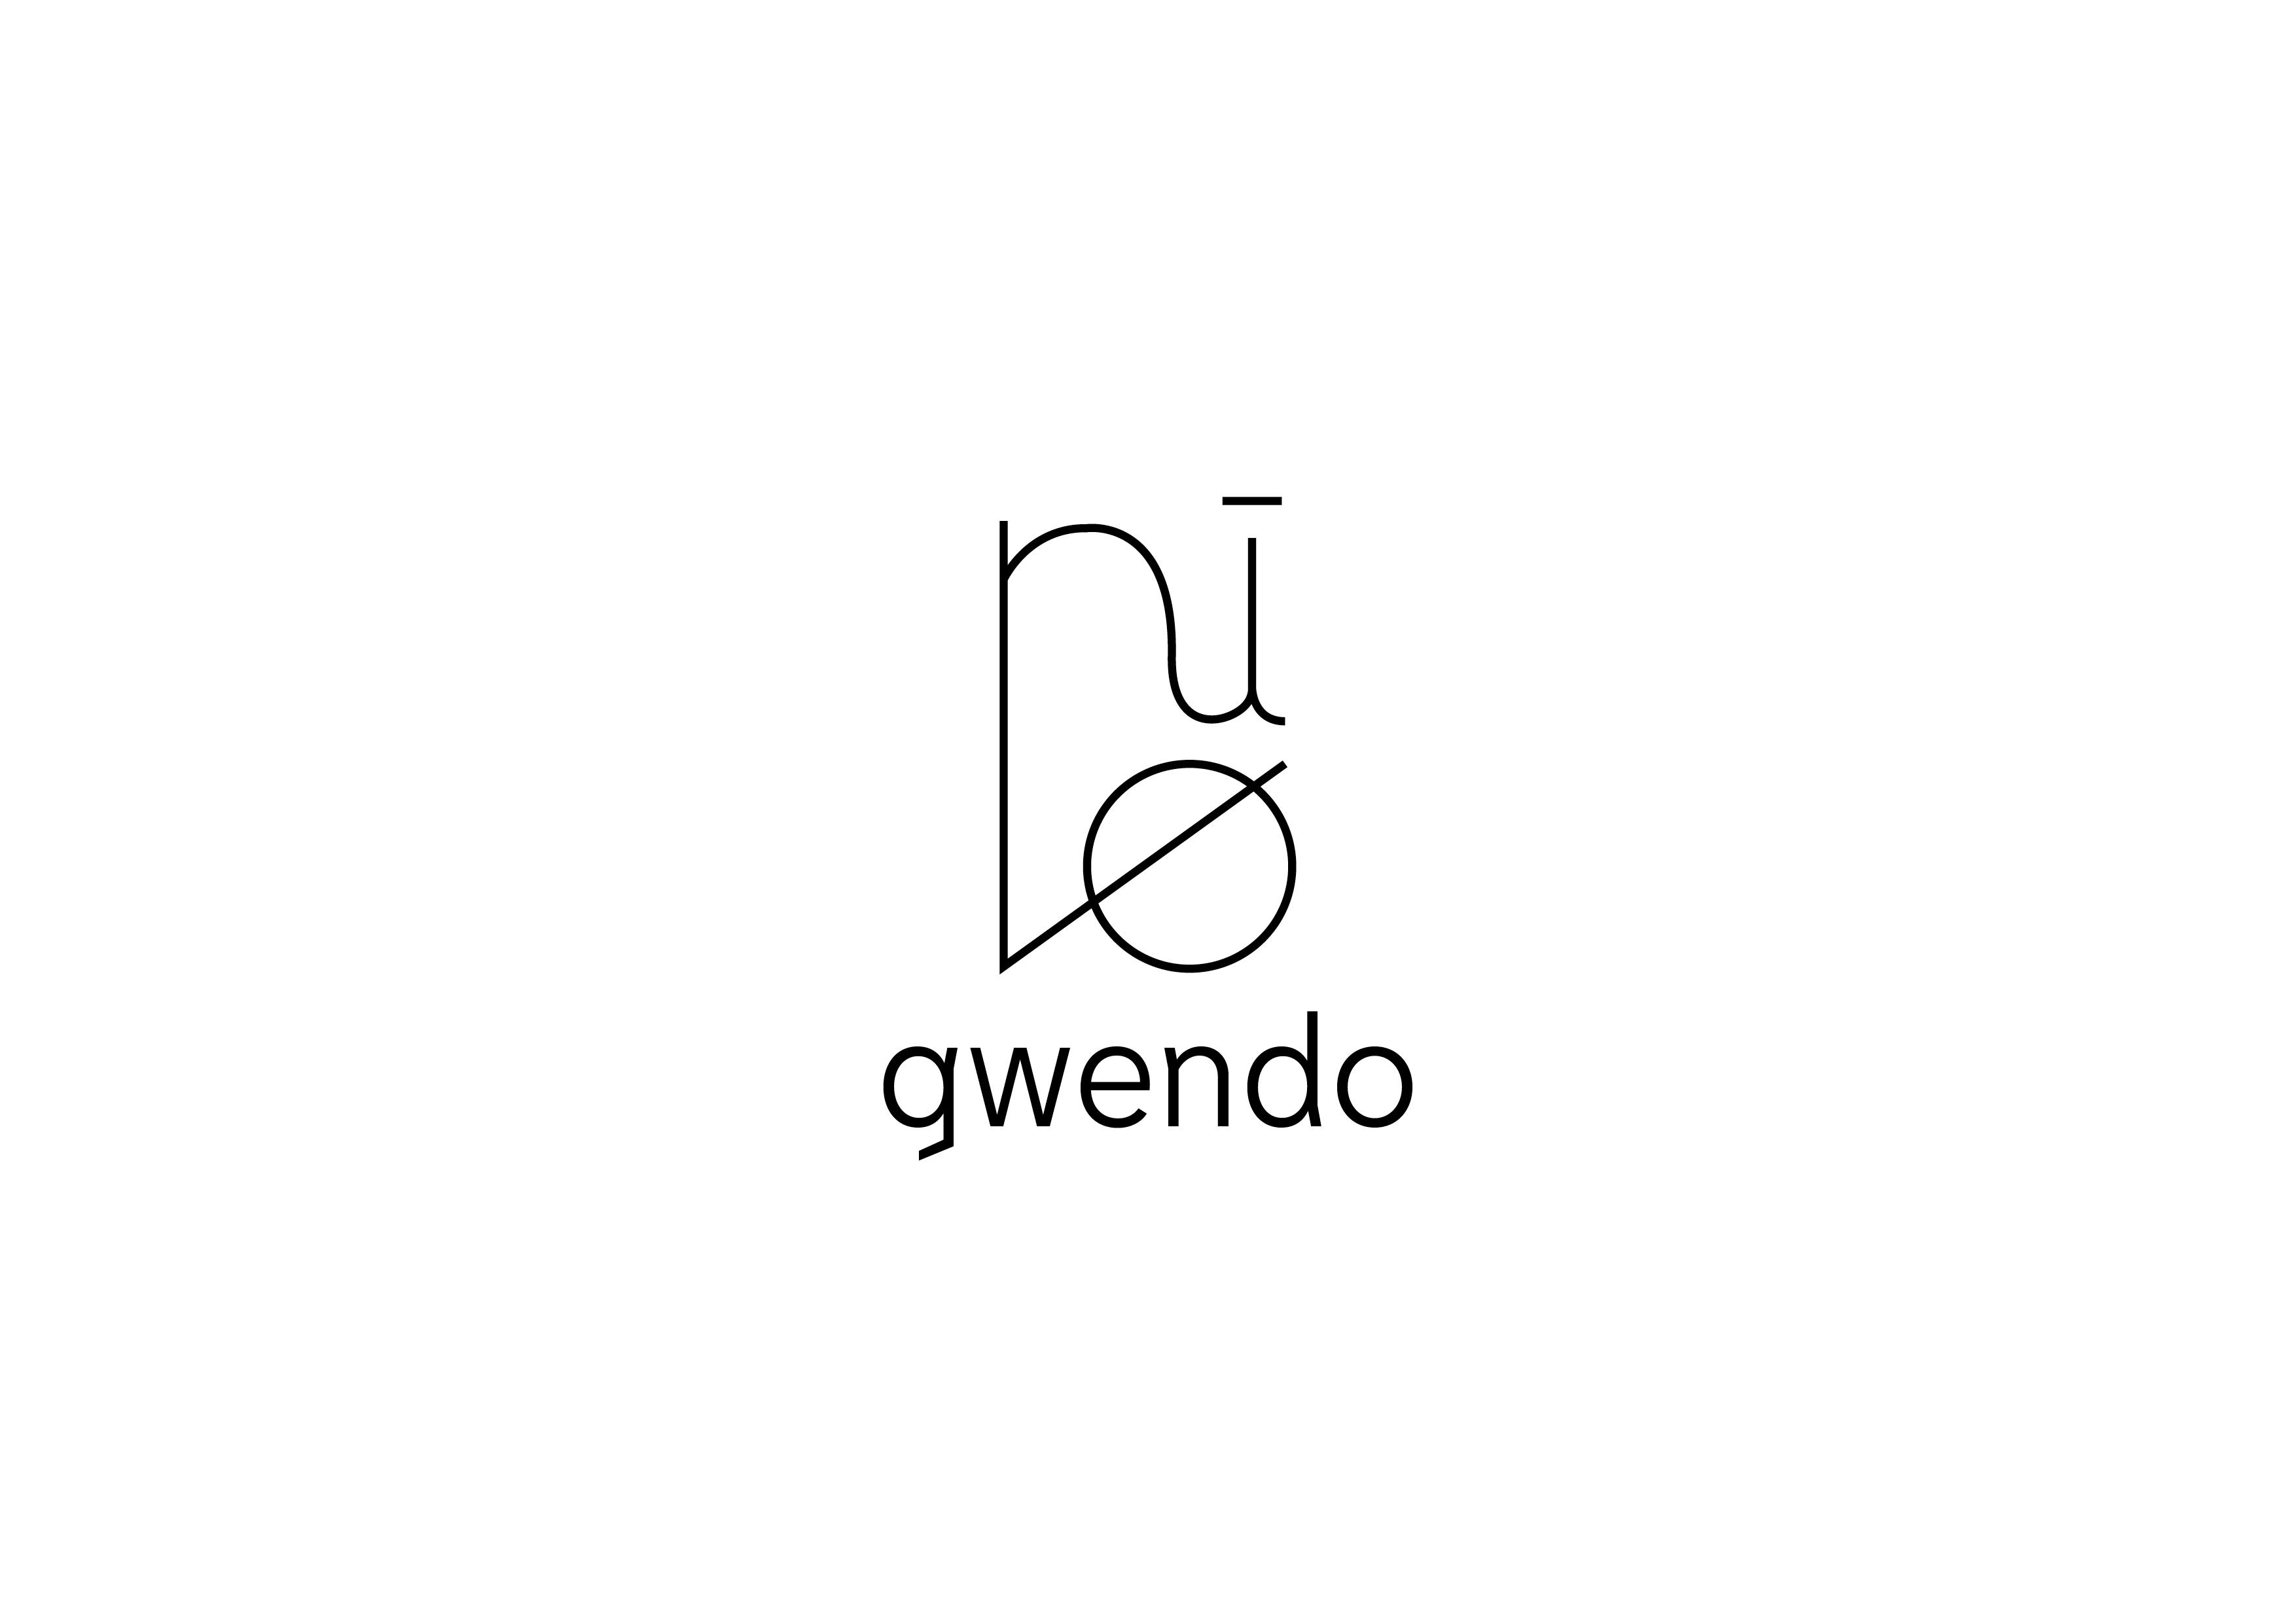 Logoentwurf nikogwendo